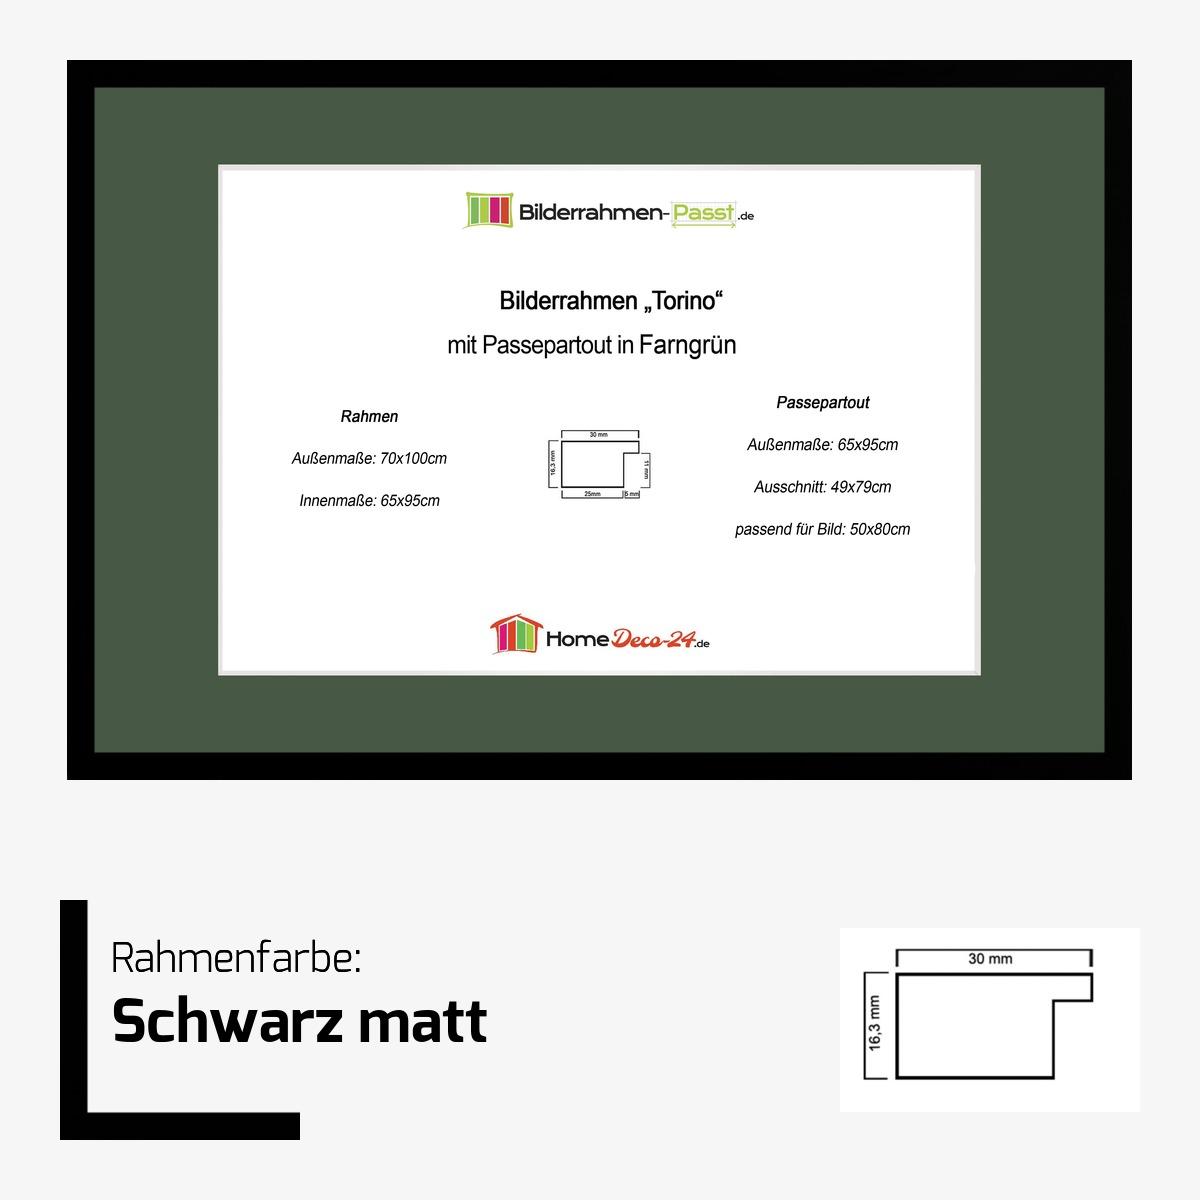 bilderrahmen torino farbwahl 65x95 cm passepartout farngruen f bild 50x80 ebay. Black Bedroom Furniture Sets. Home Design Ideas